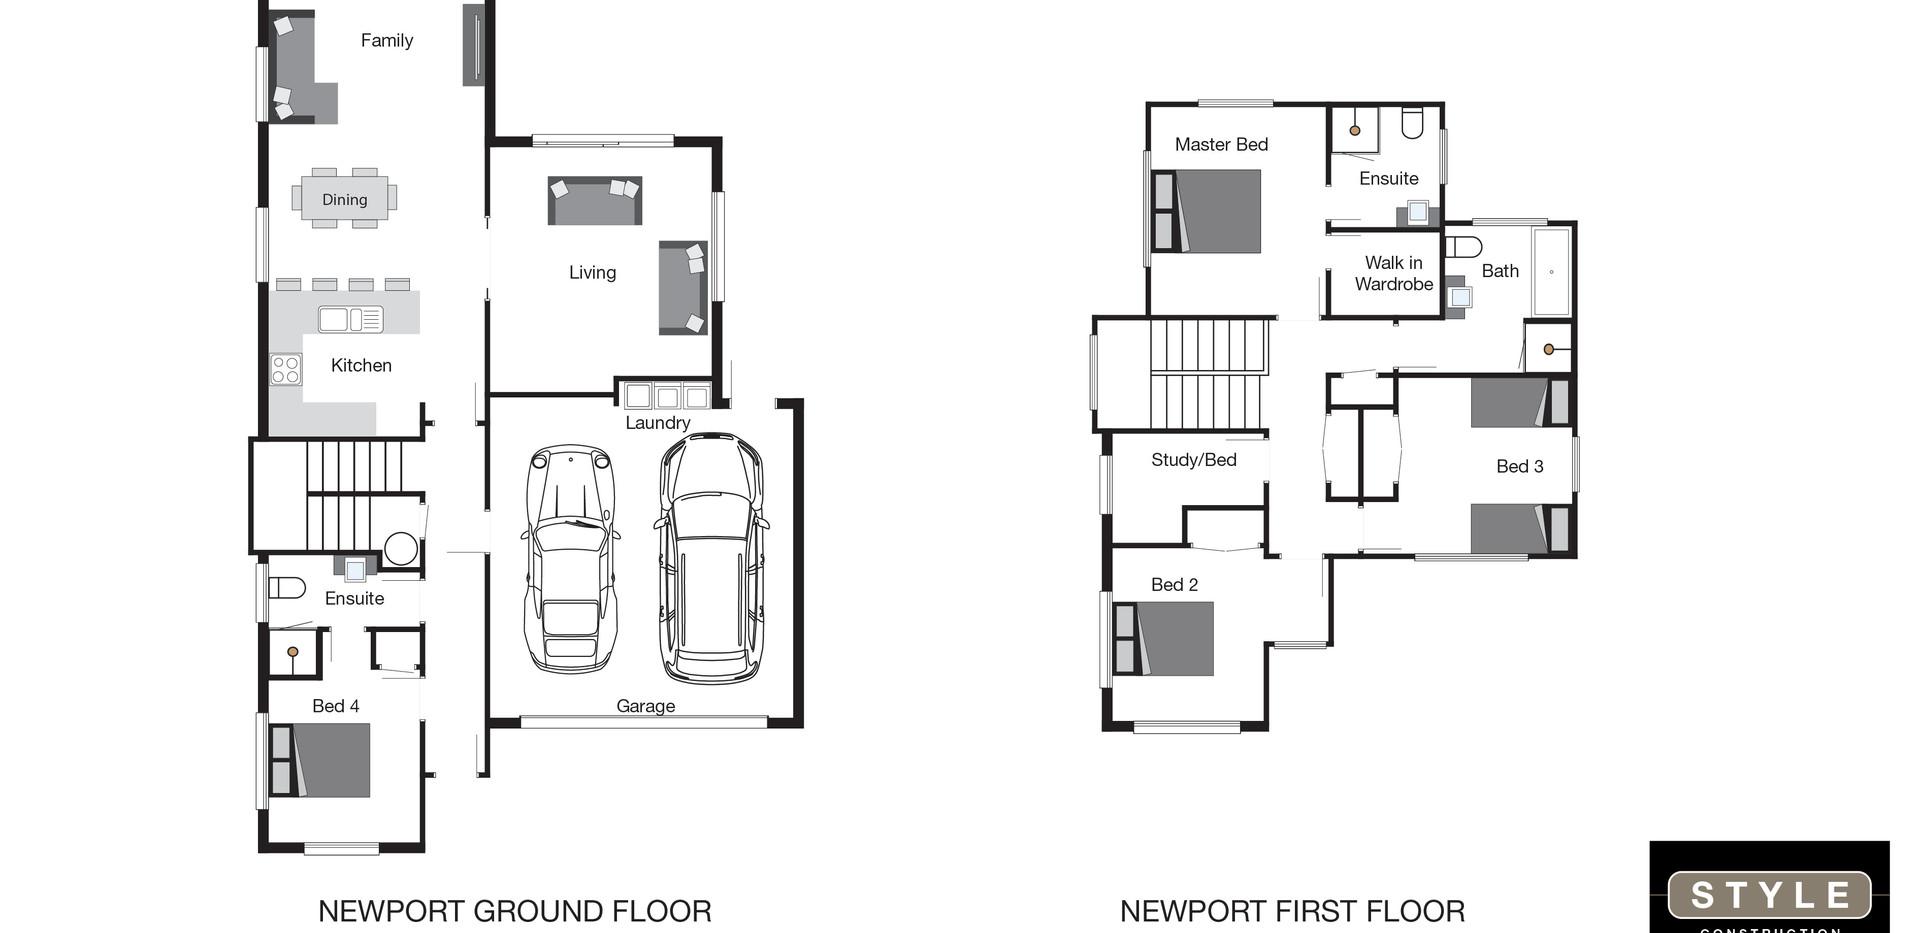 Newport web site 16 9.jpg